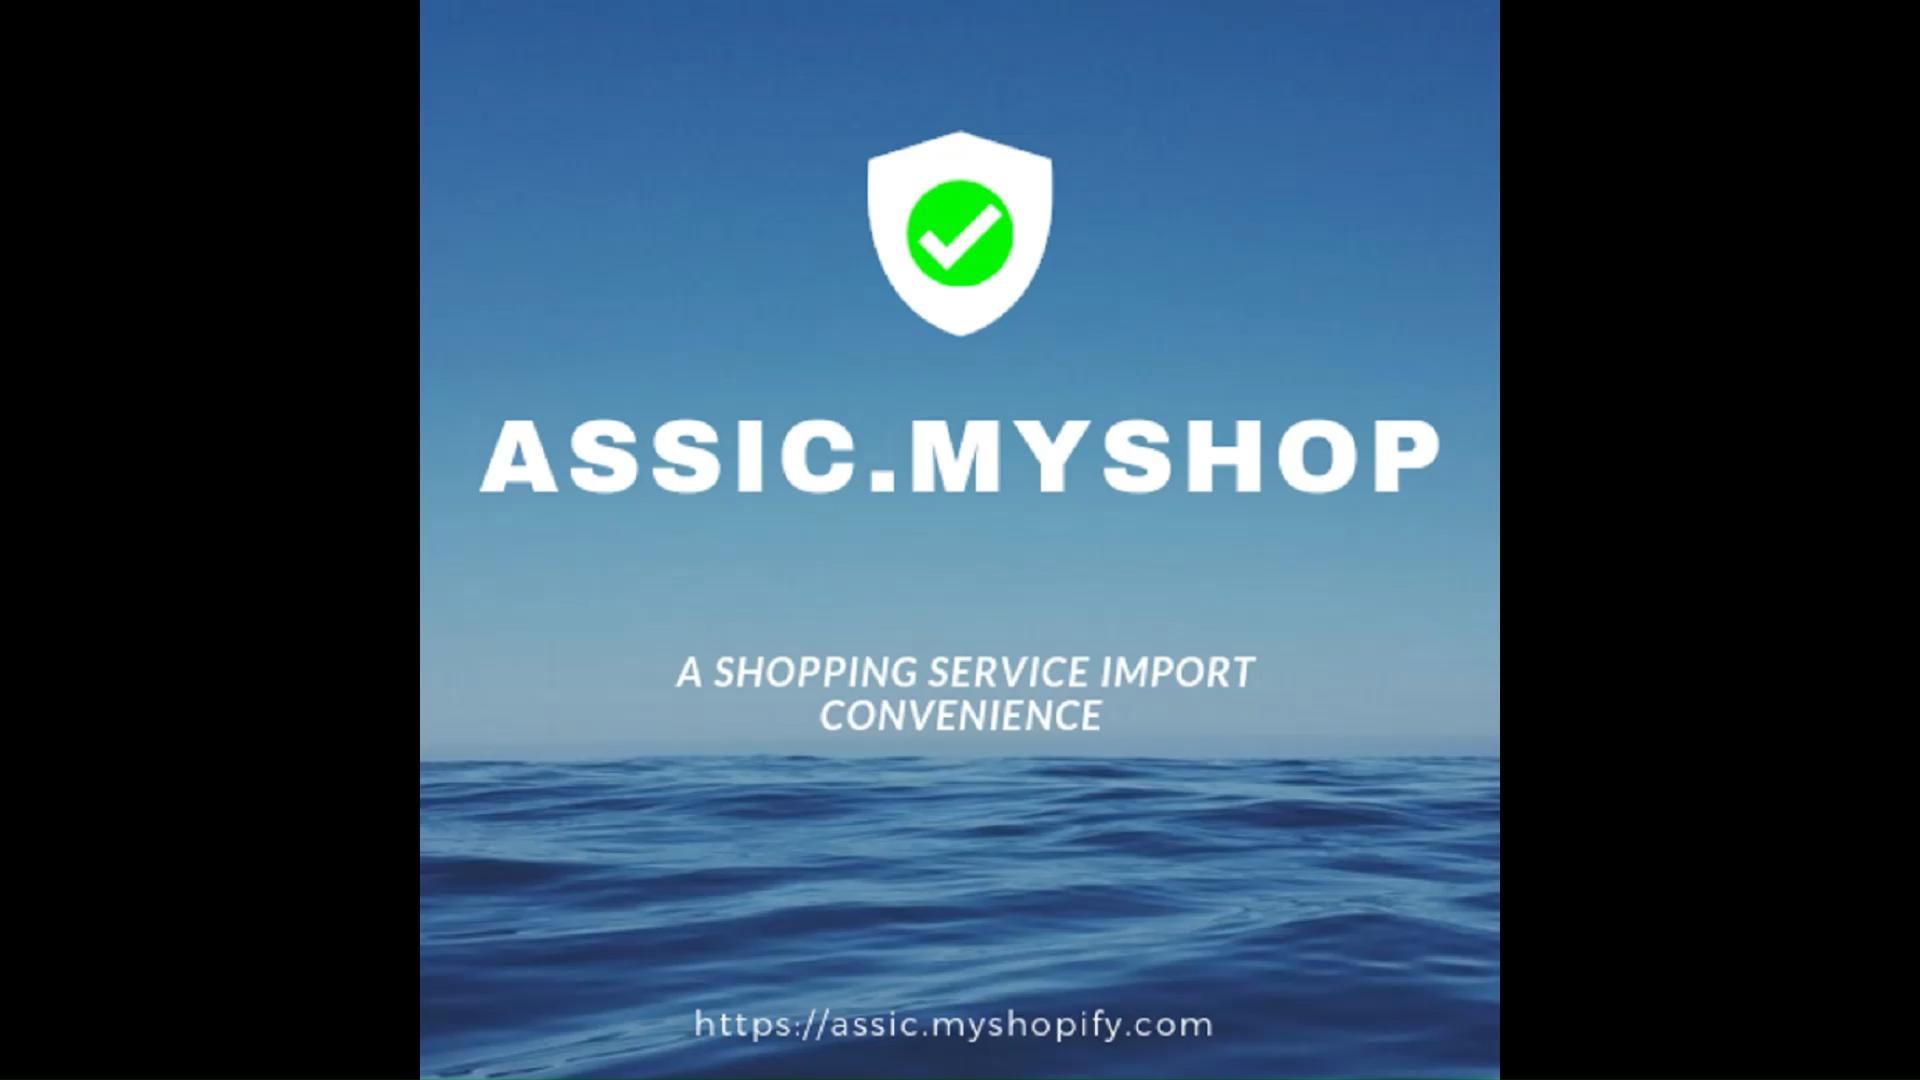 Ass Ic assic.myshop (assicmyshop) on pinterest